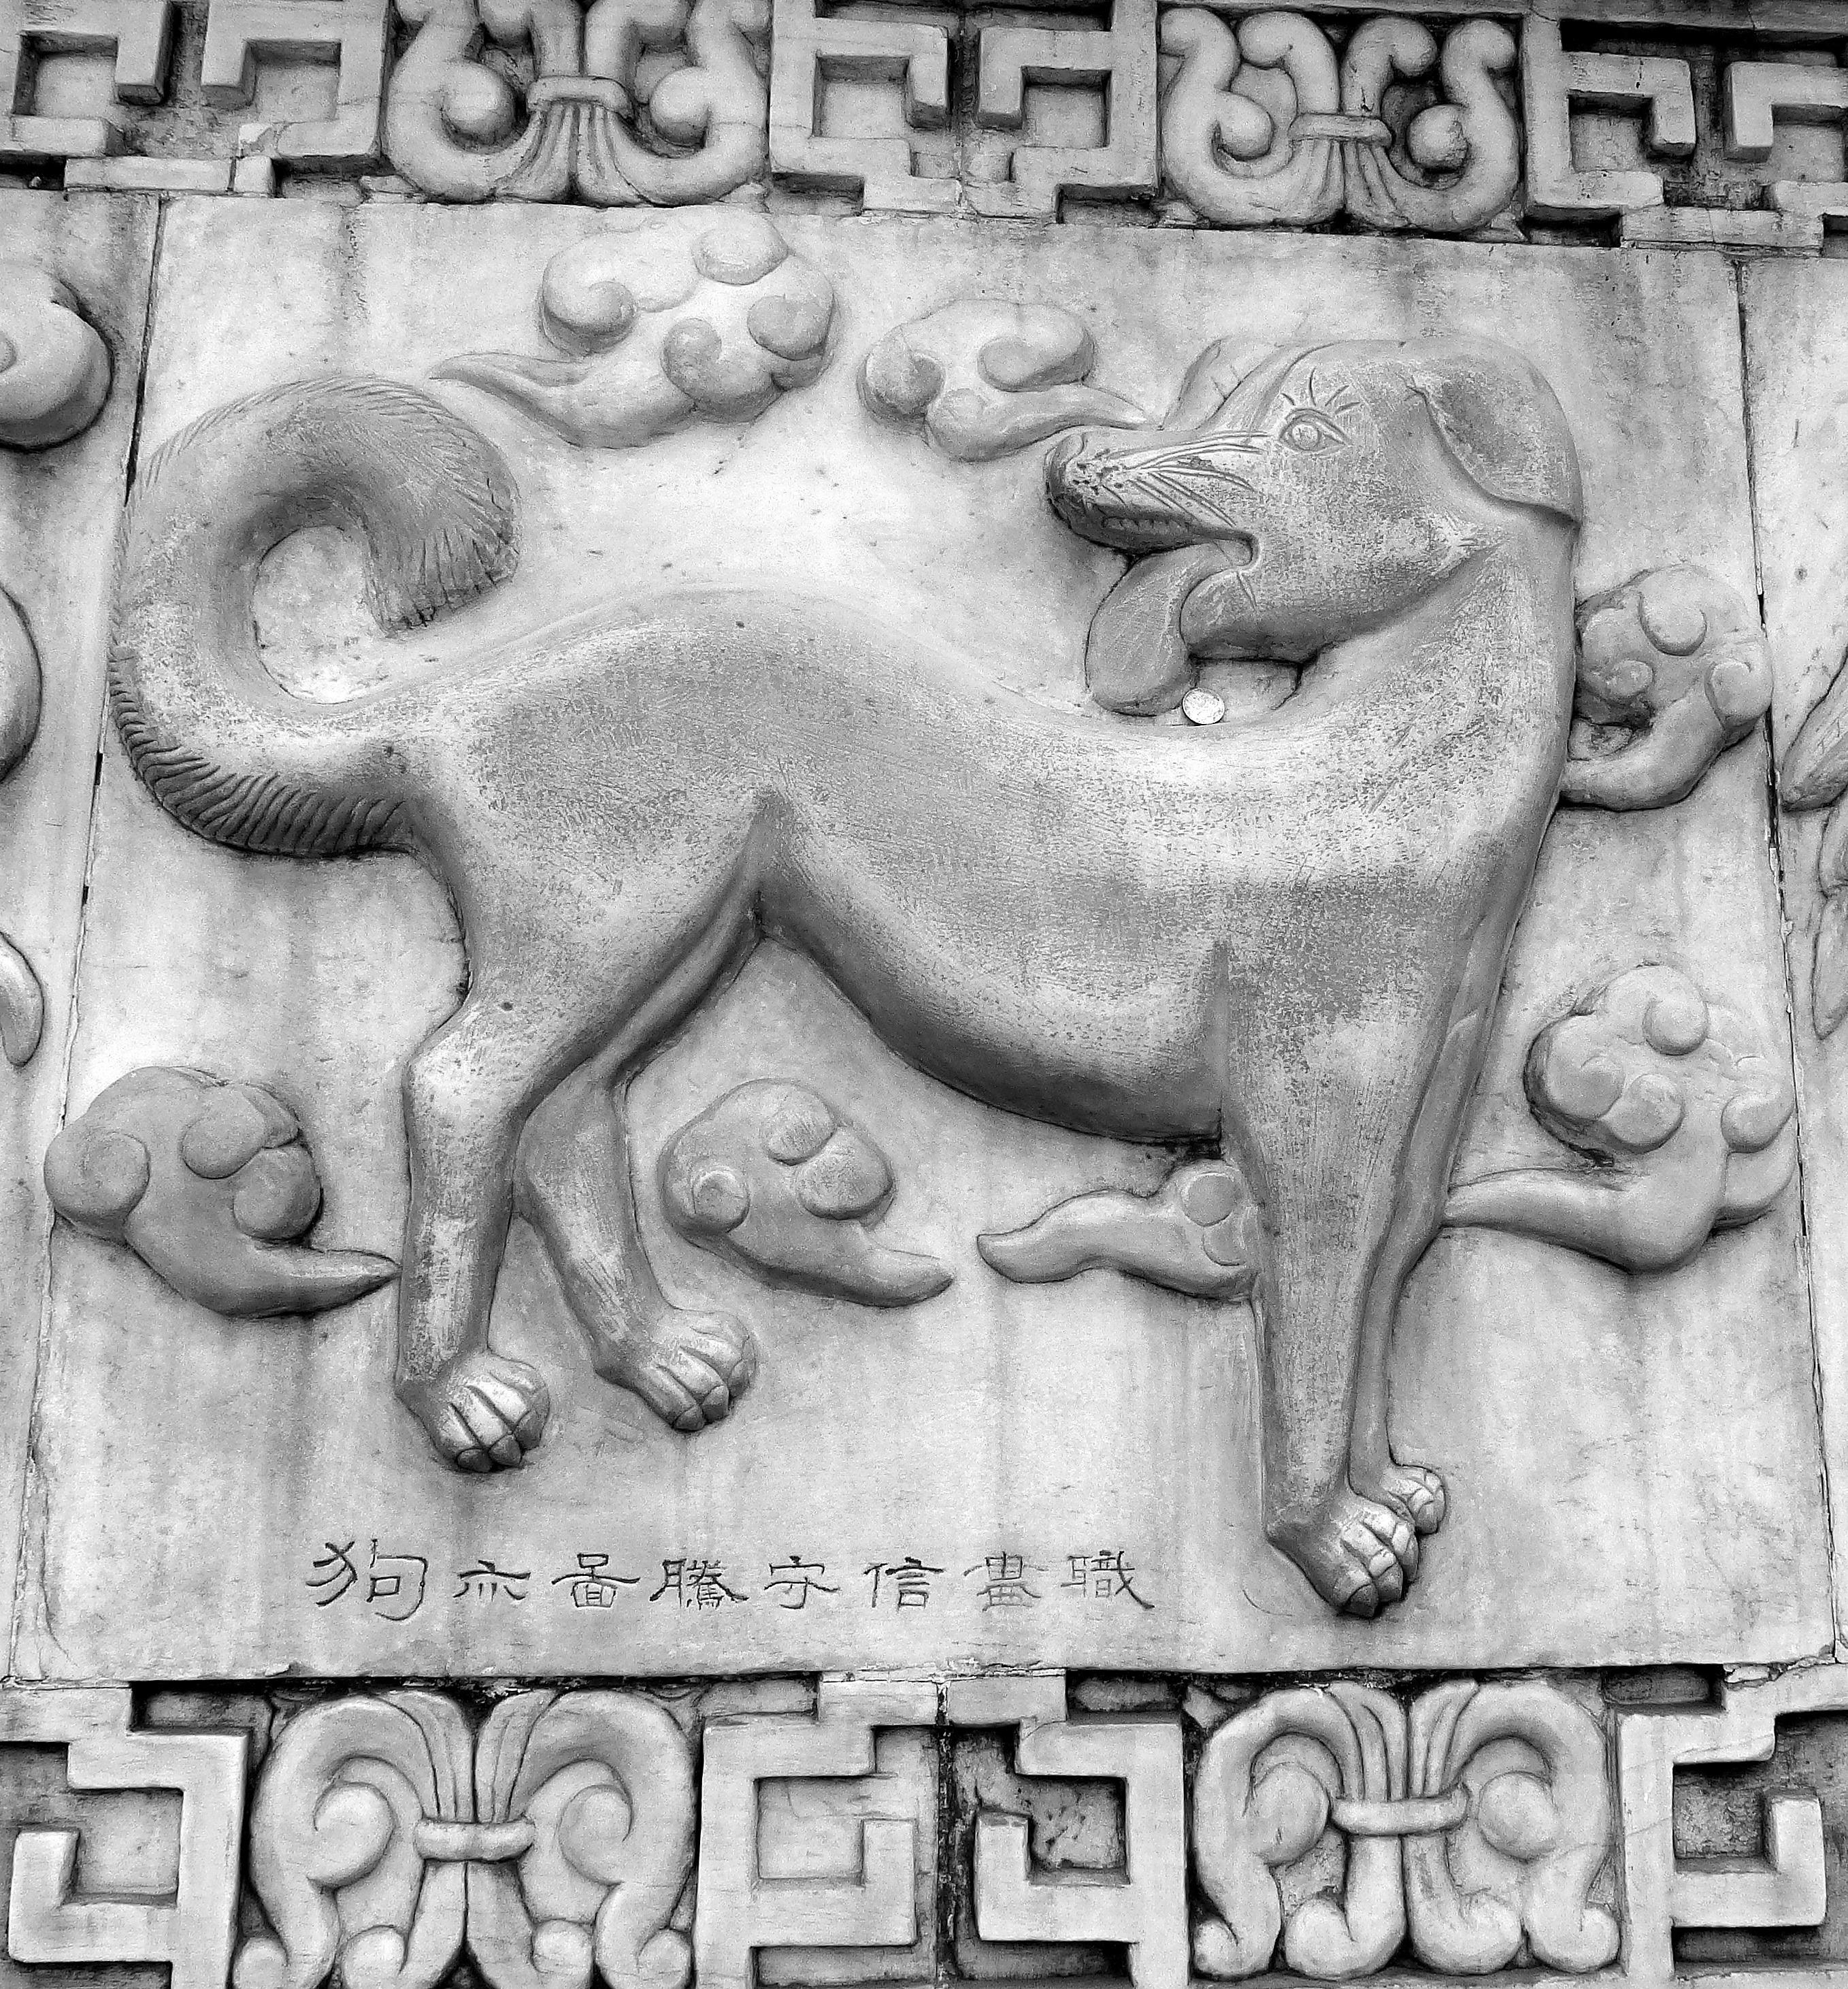 Free images creative black and white structure dog monument design animals historical stonework relief symbols mythology archaeological site stone carving monochrome photography ancient history chinese buycottarizona